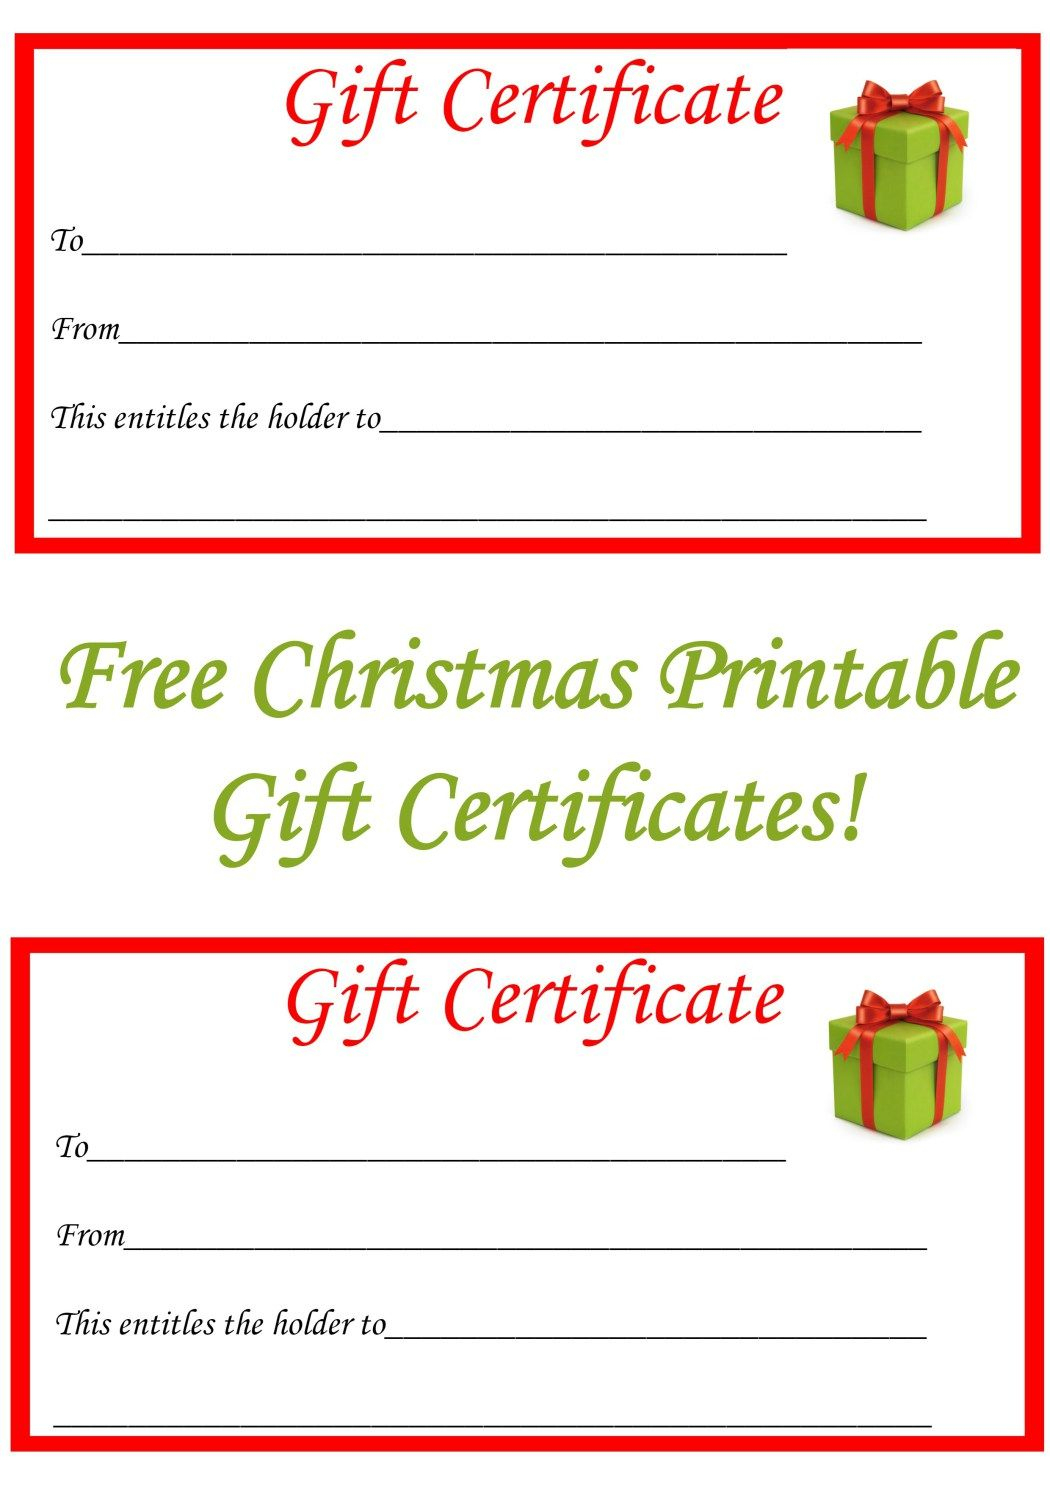 Free Christmas Printable Gift Certificates | Gift Ideas | Pinterest - Free Printable Christmas Gift Voucher Templates